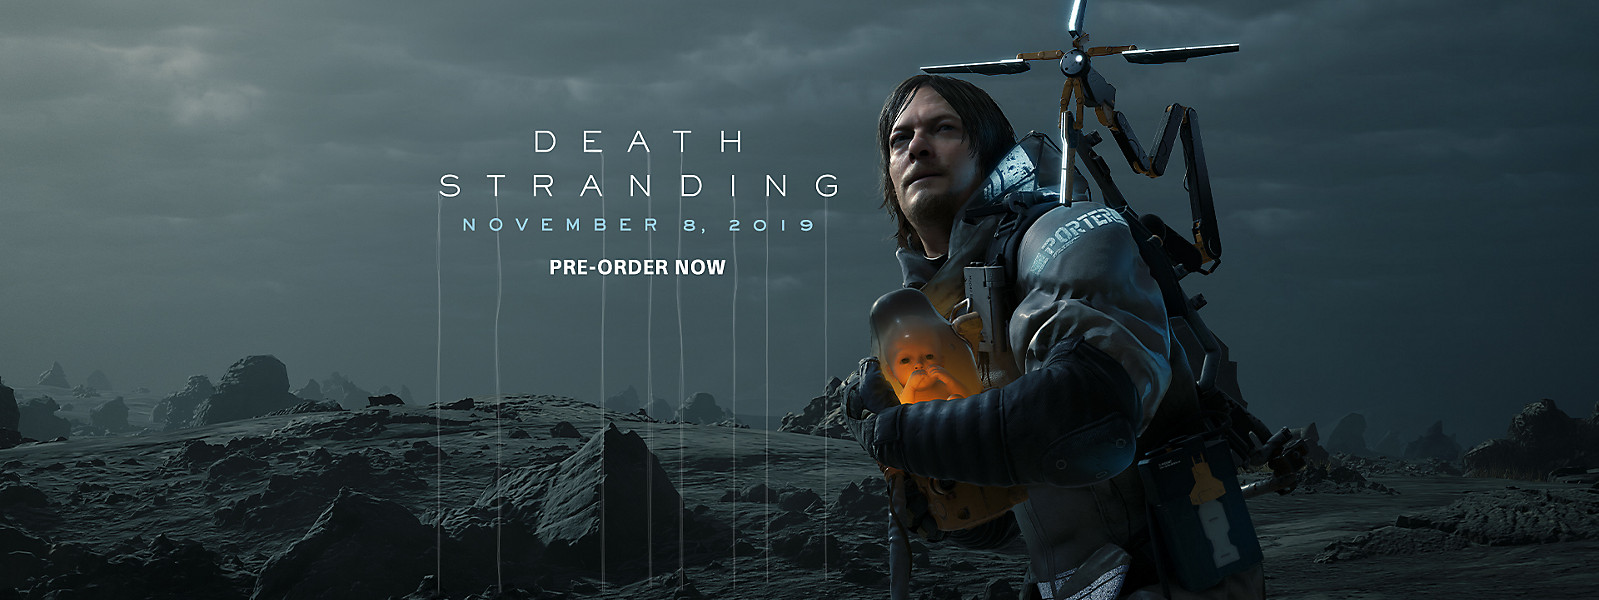 death stranding pre order install game itecnoshop